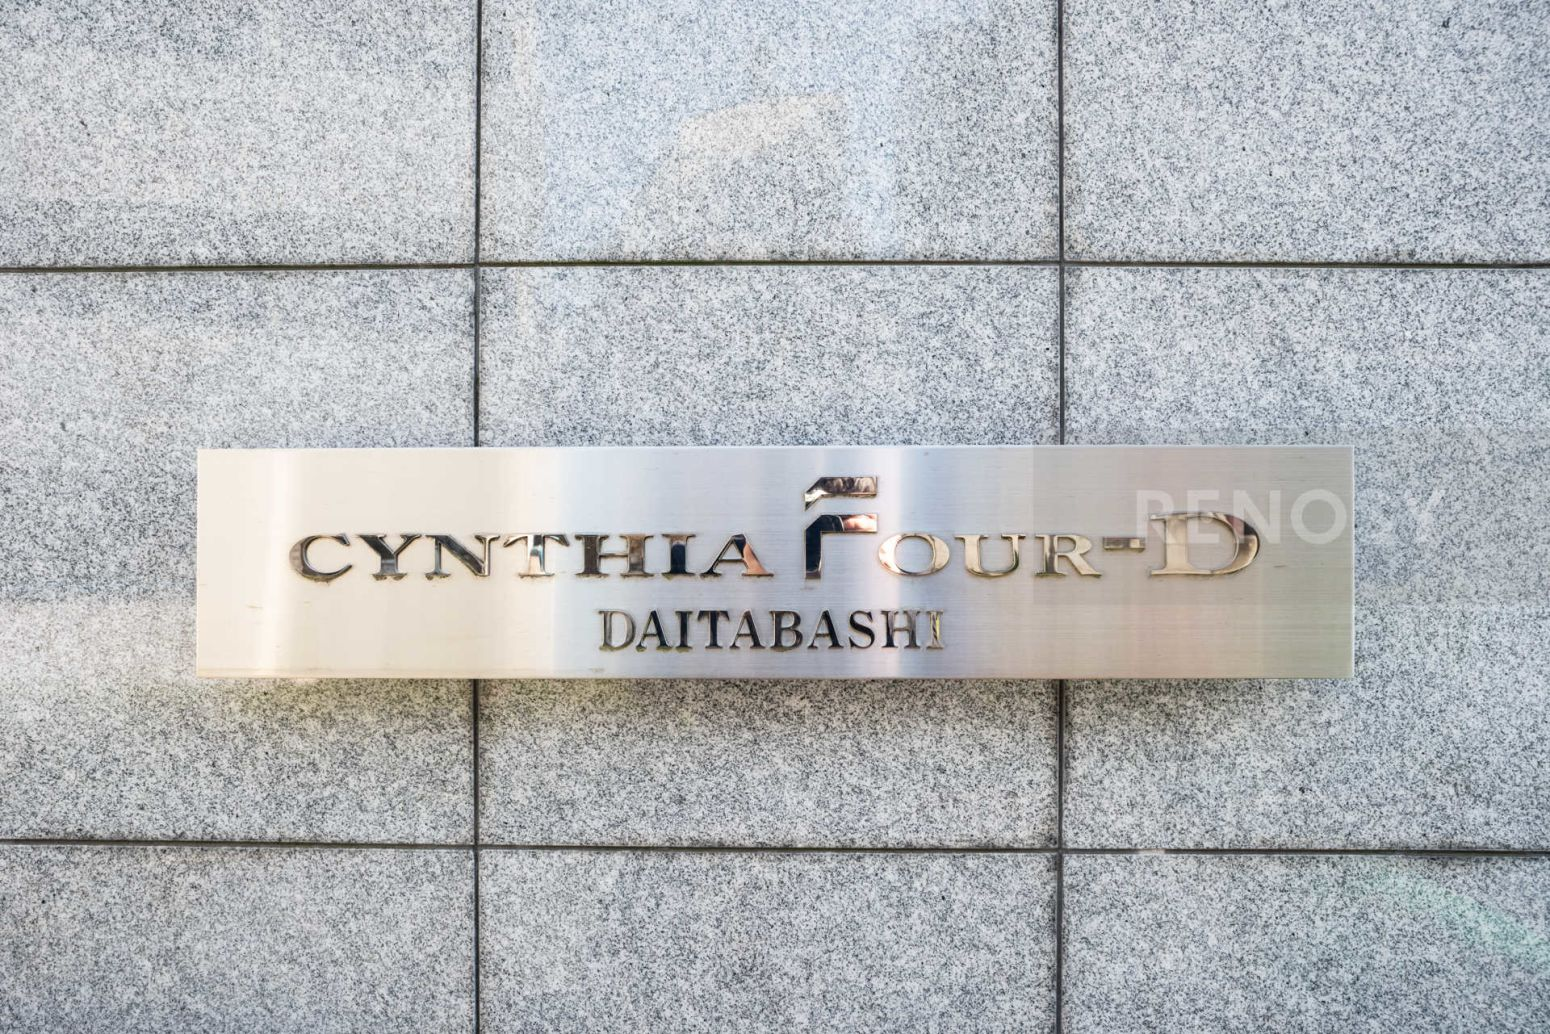 CYNTHIAFOUR-D DAITABASHI